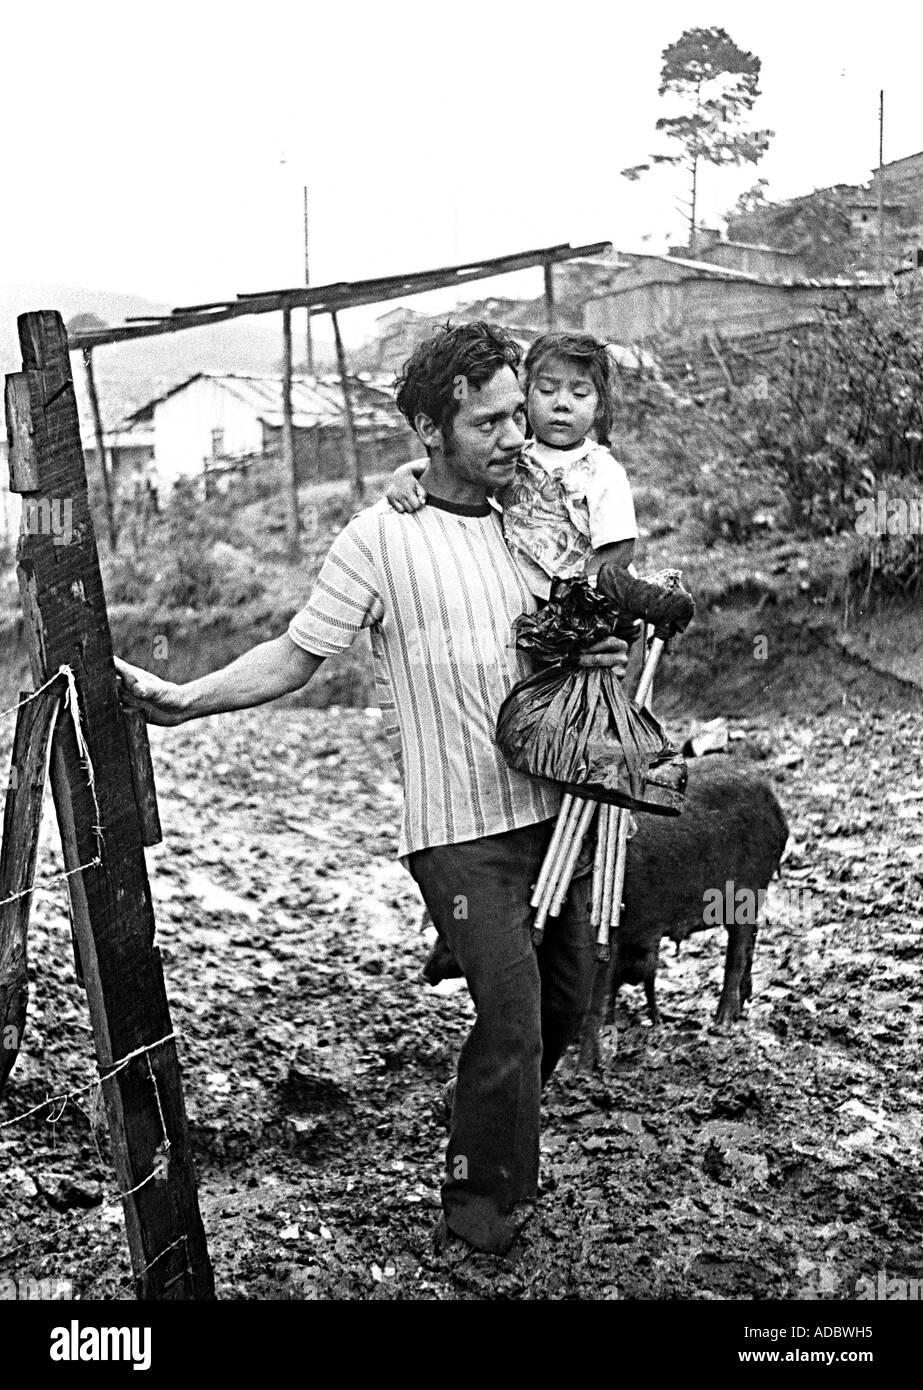 Tegucigalpa, Honduras. A poorman with his dauhter. Stock Photo